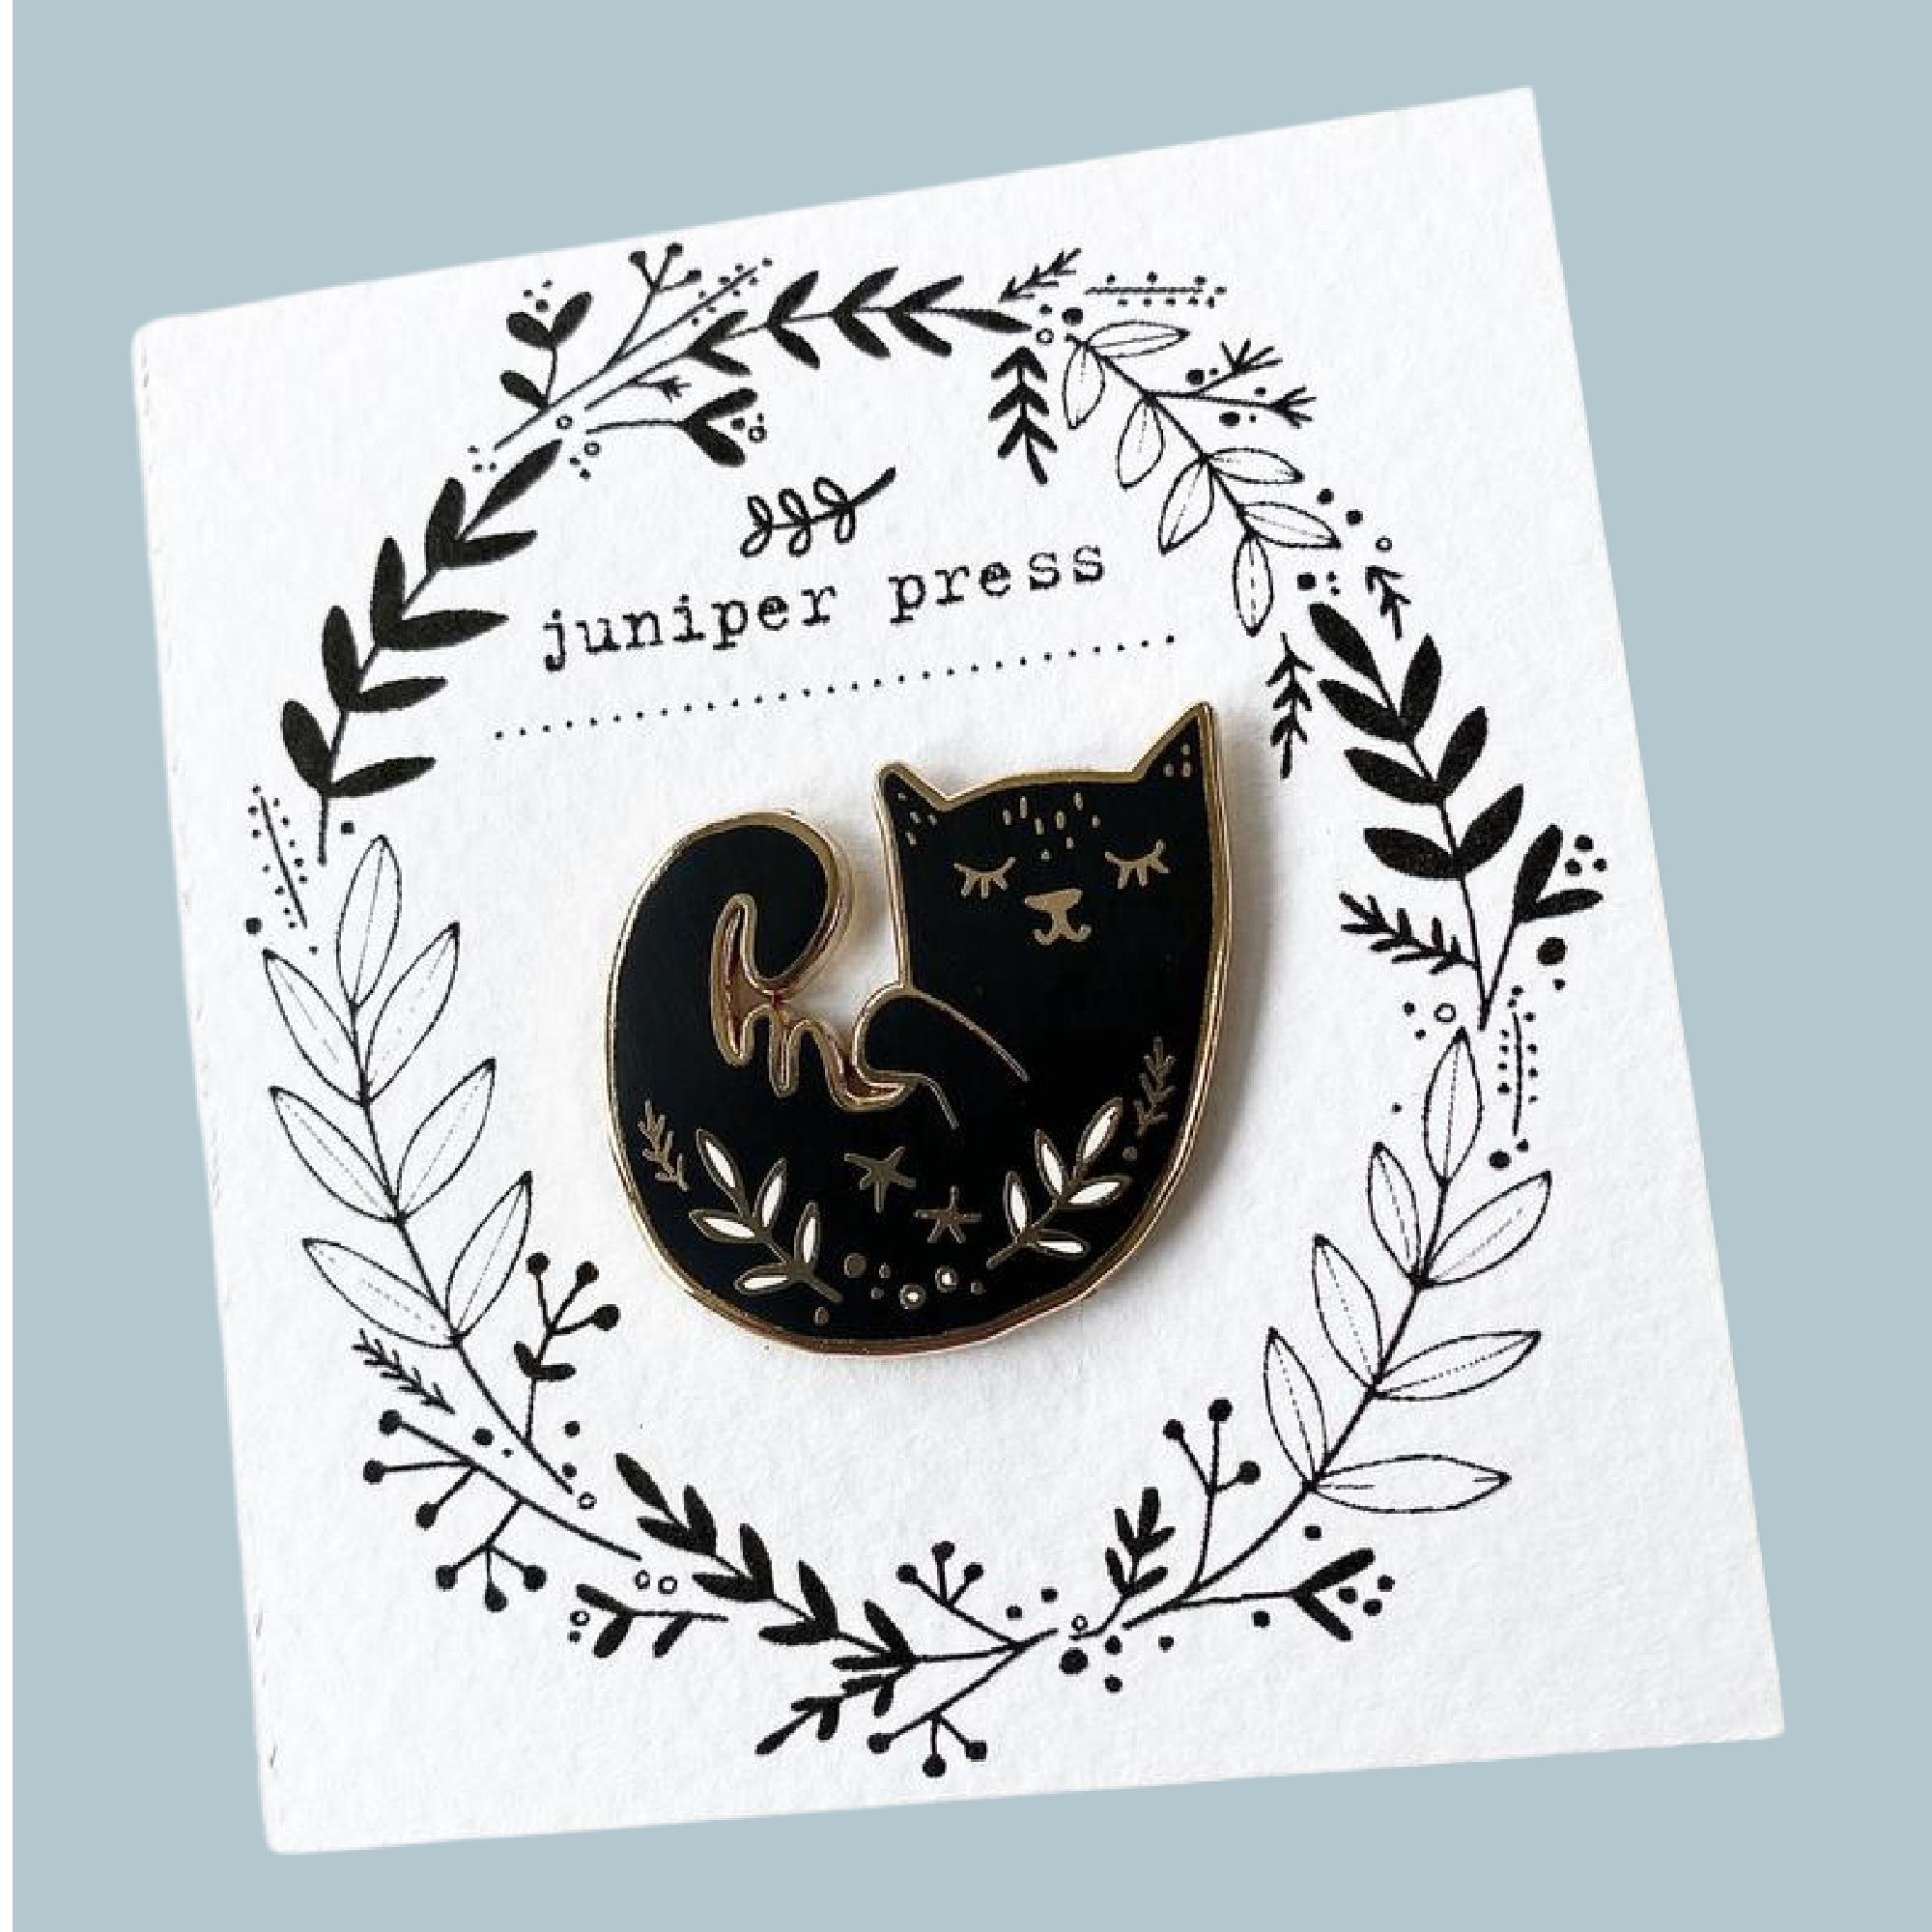 Cat Pin by Juniper Press